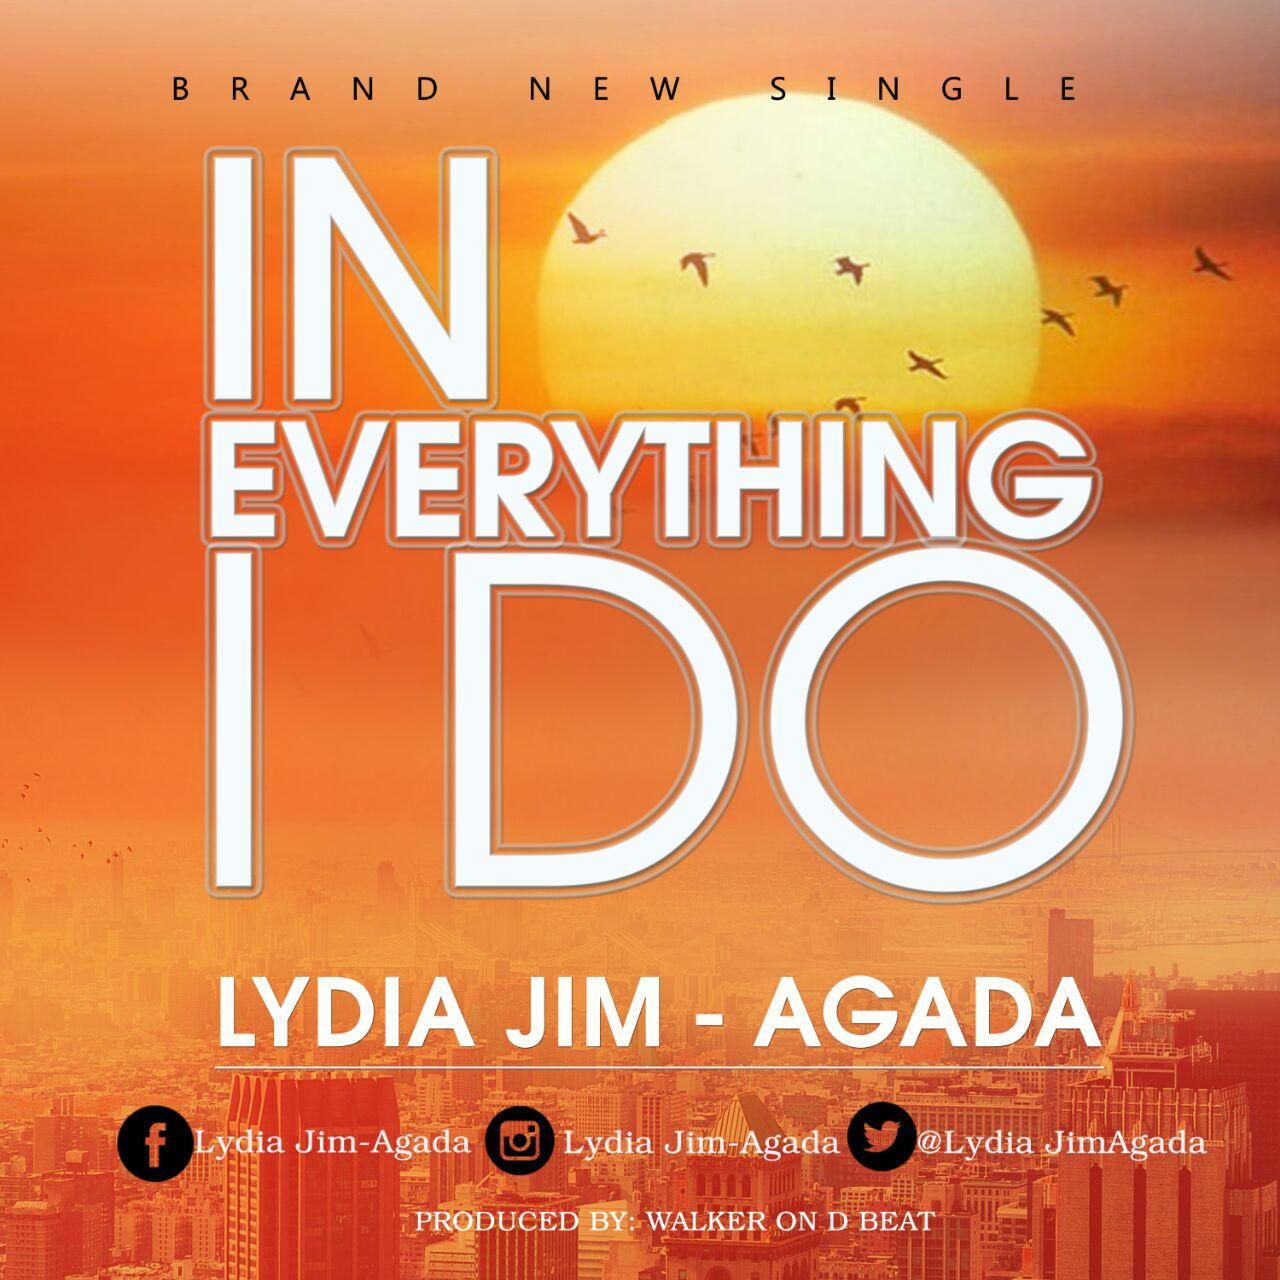 IN EVERYTHING I DO - Lydia Jim-Agada [@LydiaJimAgada]